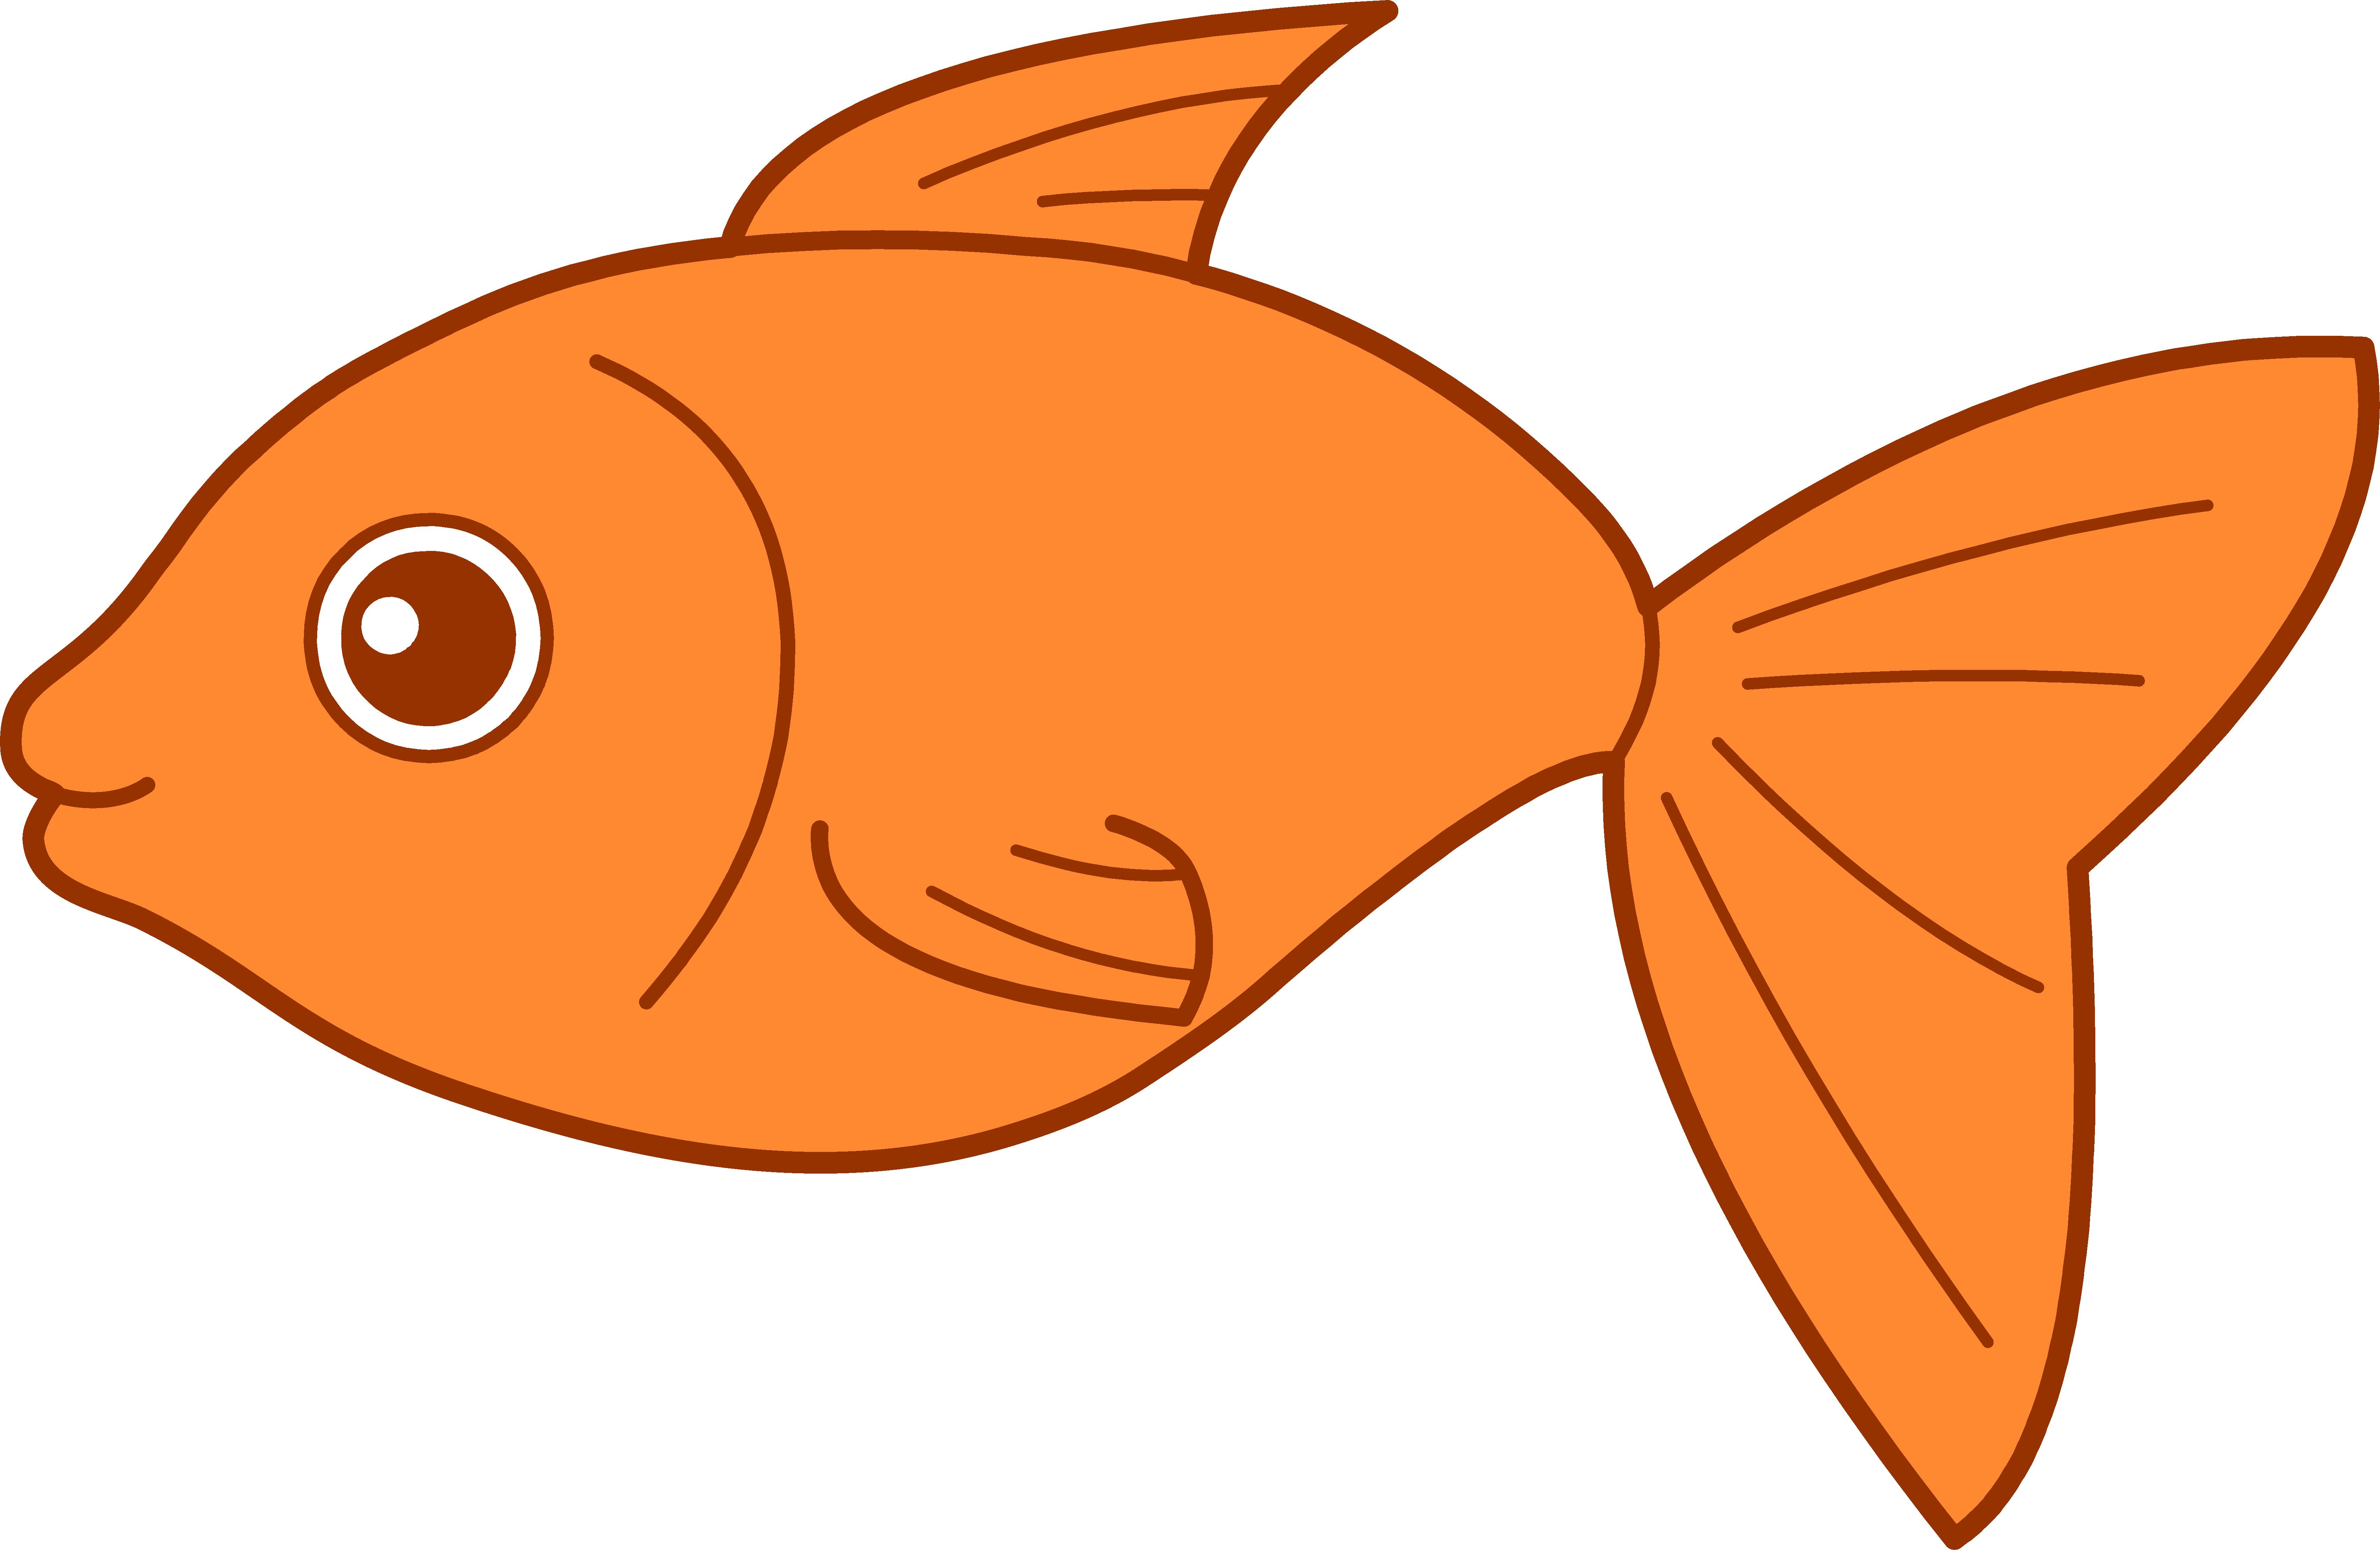 Free Fish Clip Art Pictures | Clipart li-Free Fish Clip Art Pictures | Clipart library - Free Clipart Images-2